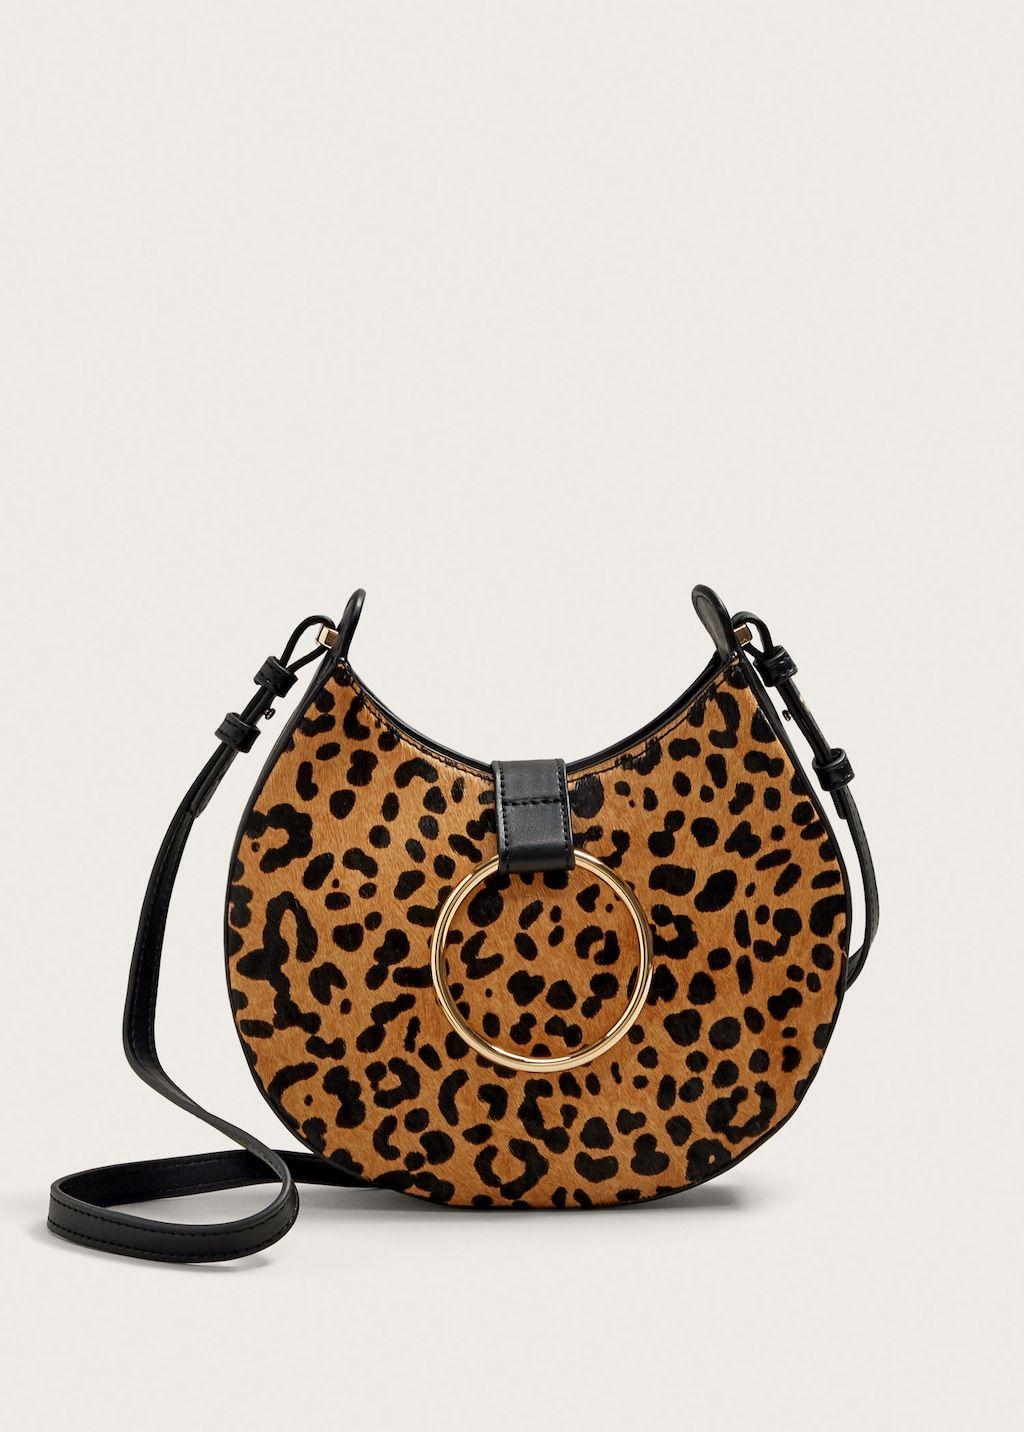 Animal Print Leather Bag Plus Sizes